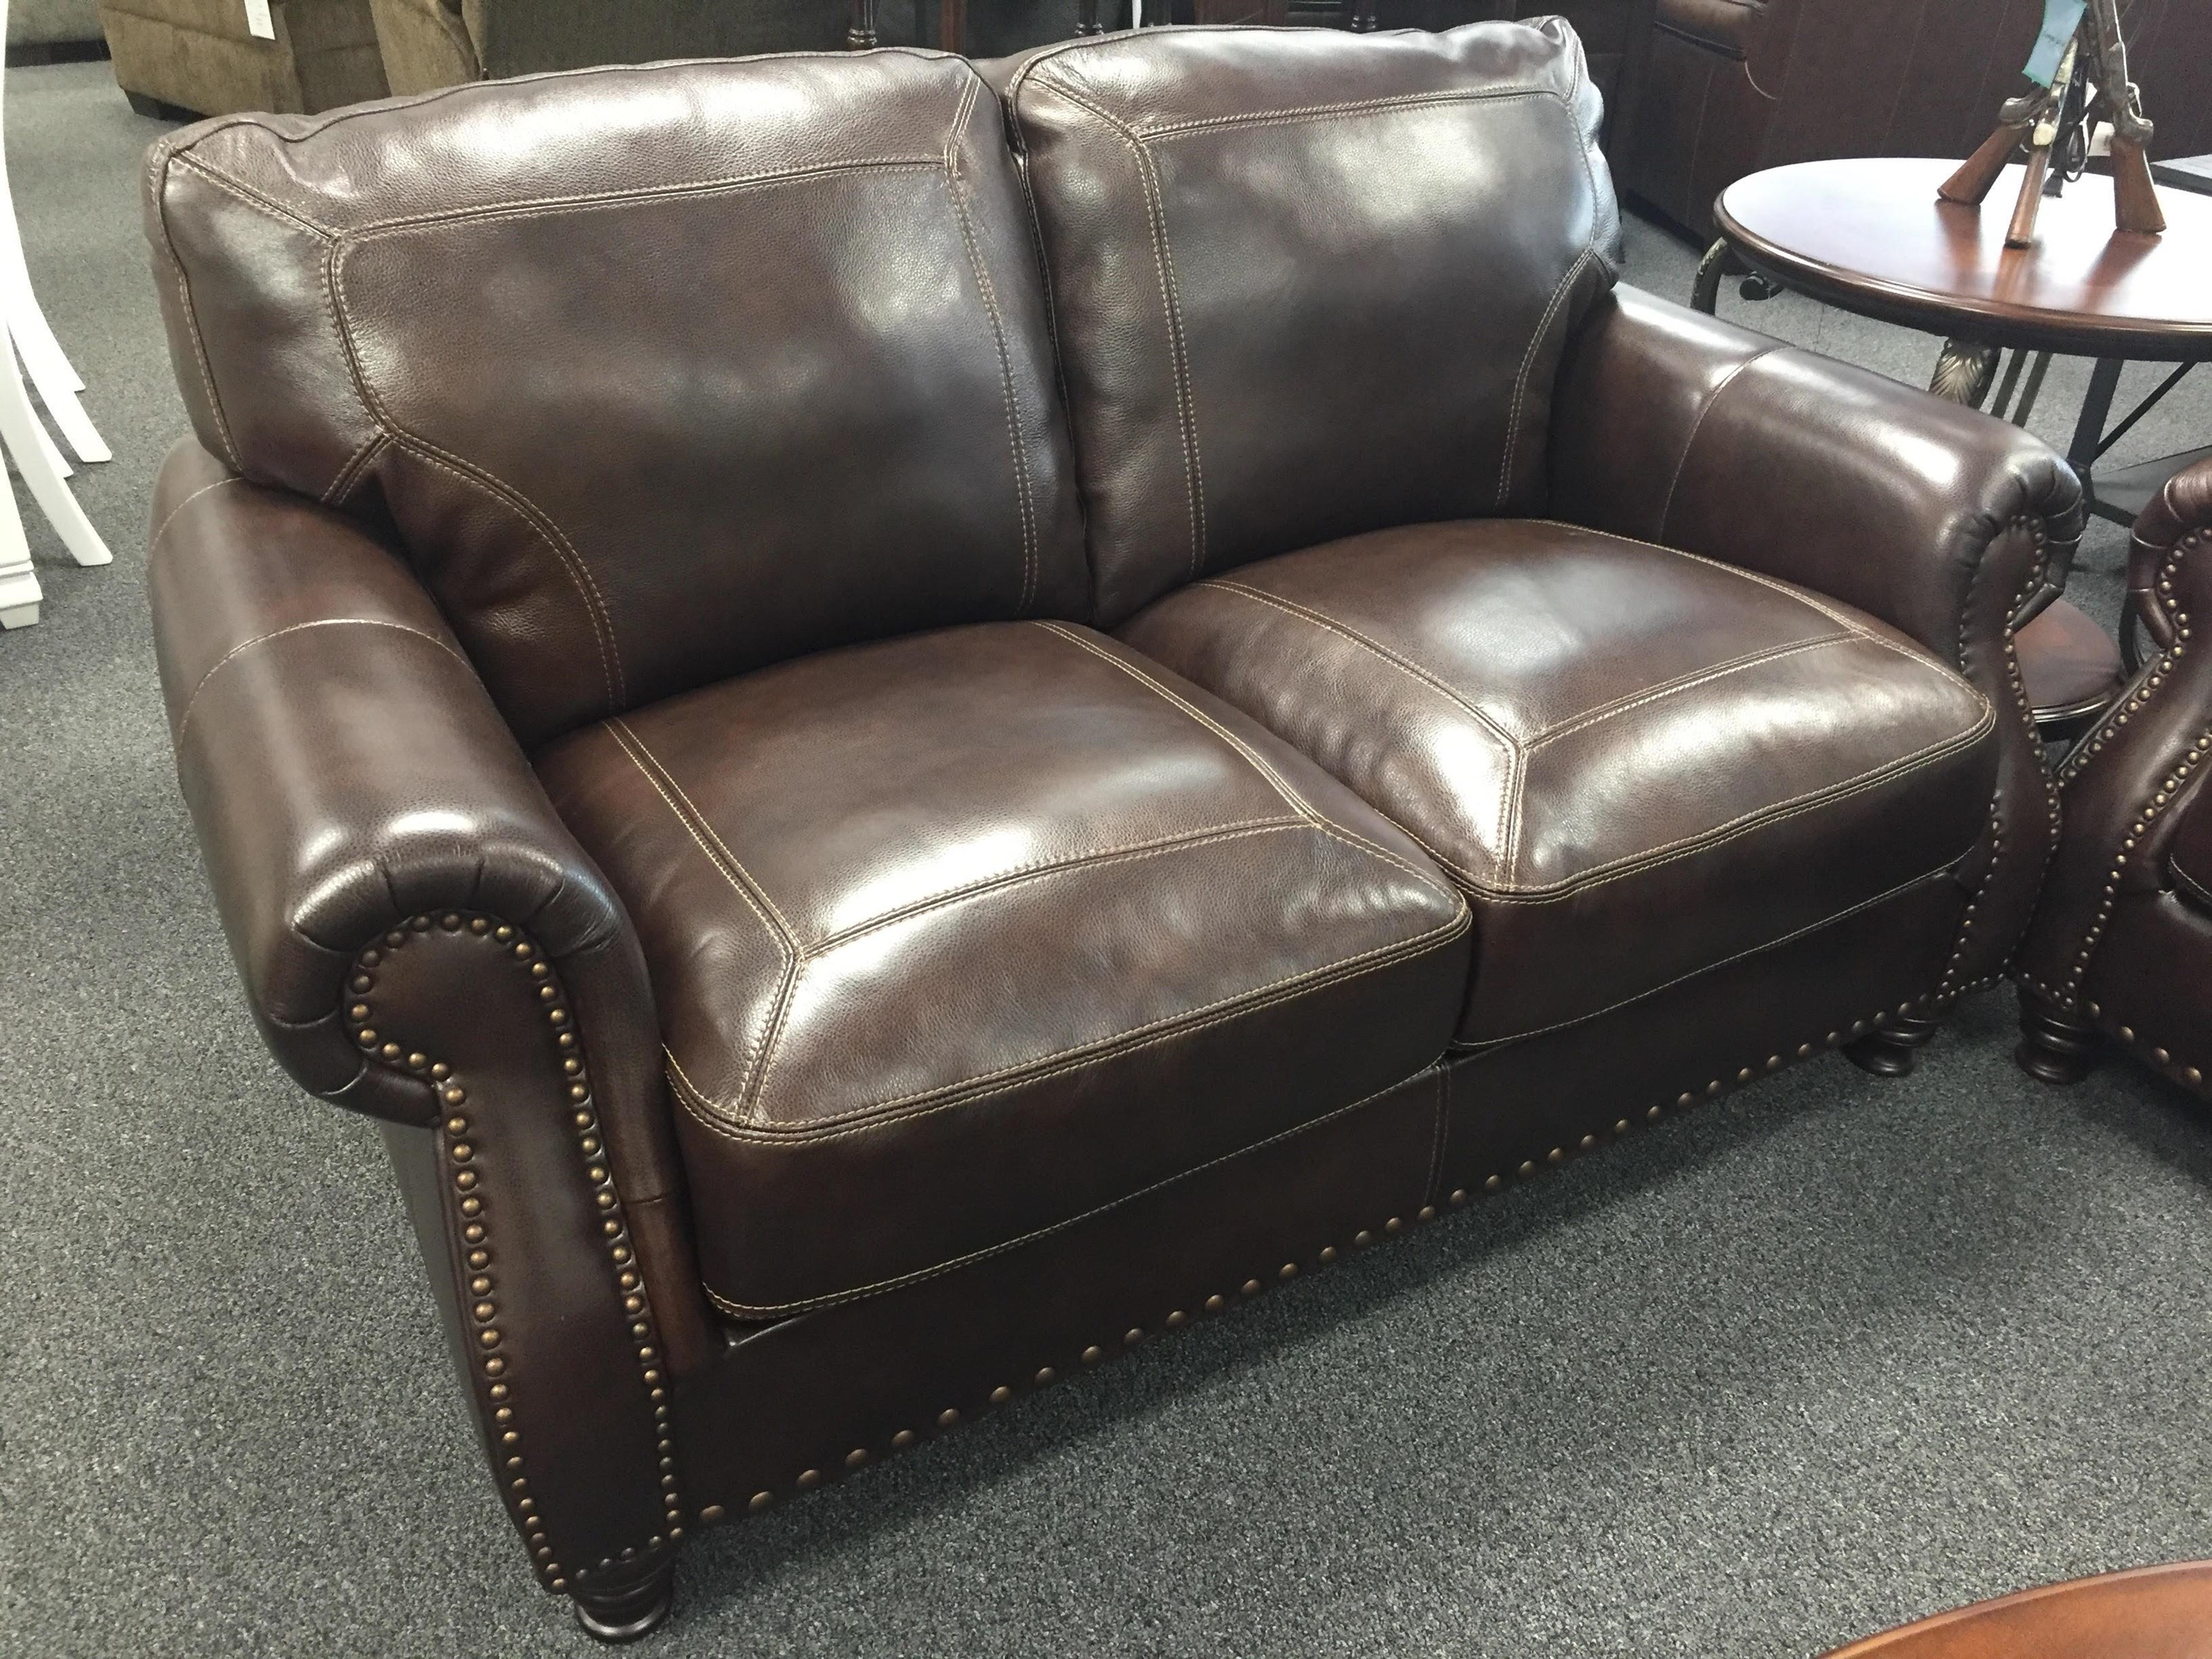 6978 Leather Loveseat by Simon Li at Furniture Fair - North Carolina